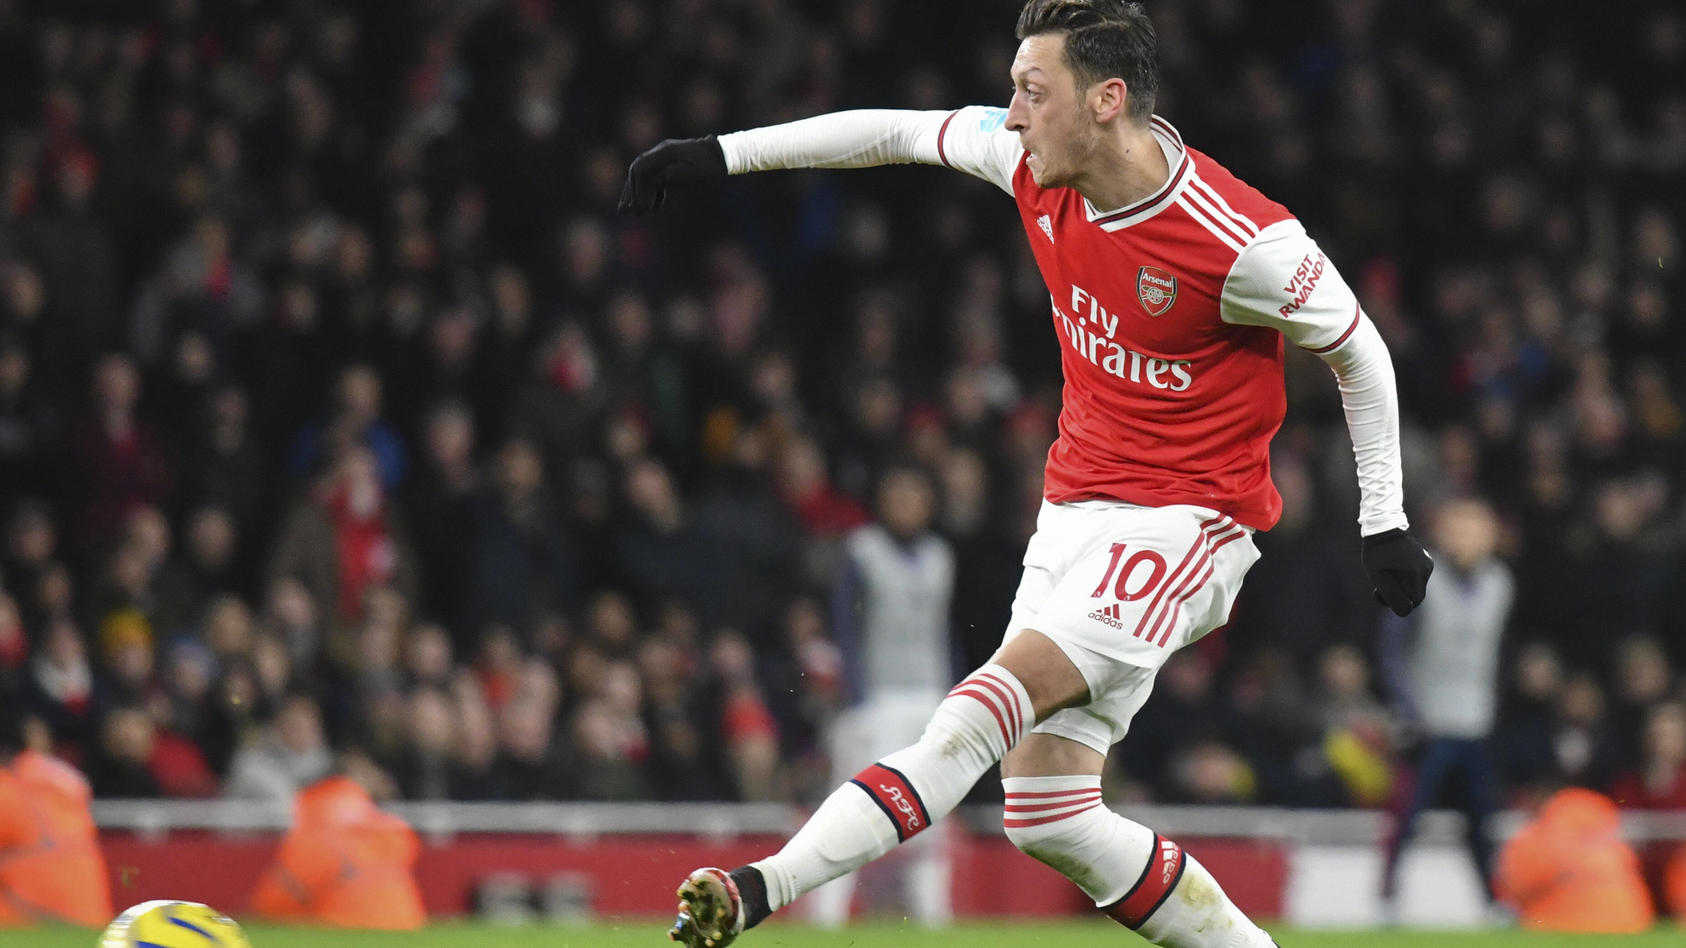 Football - 2019 / 2020 Premier League - Arsenal vs. Newcastle Mesut Özil of Arsenal scores his team s third goal, at Th